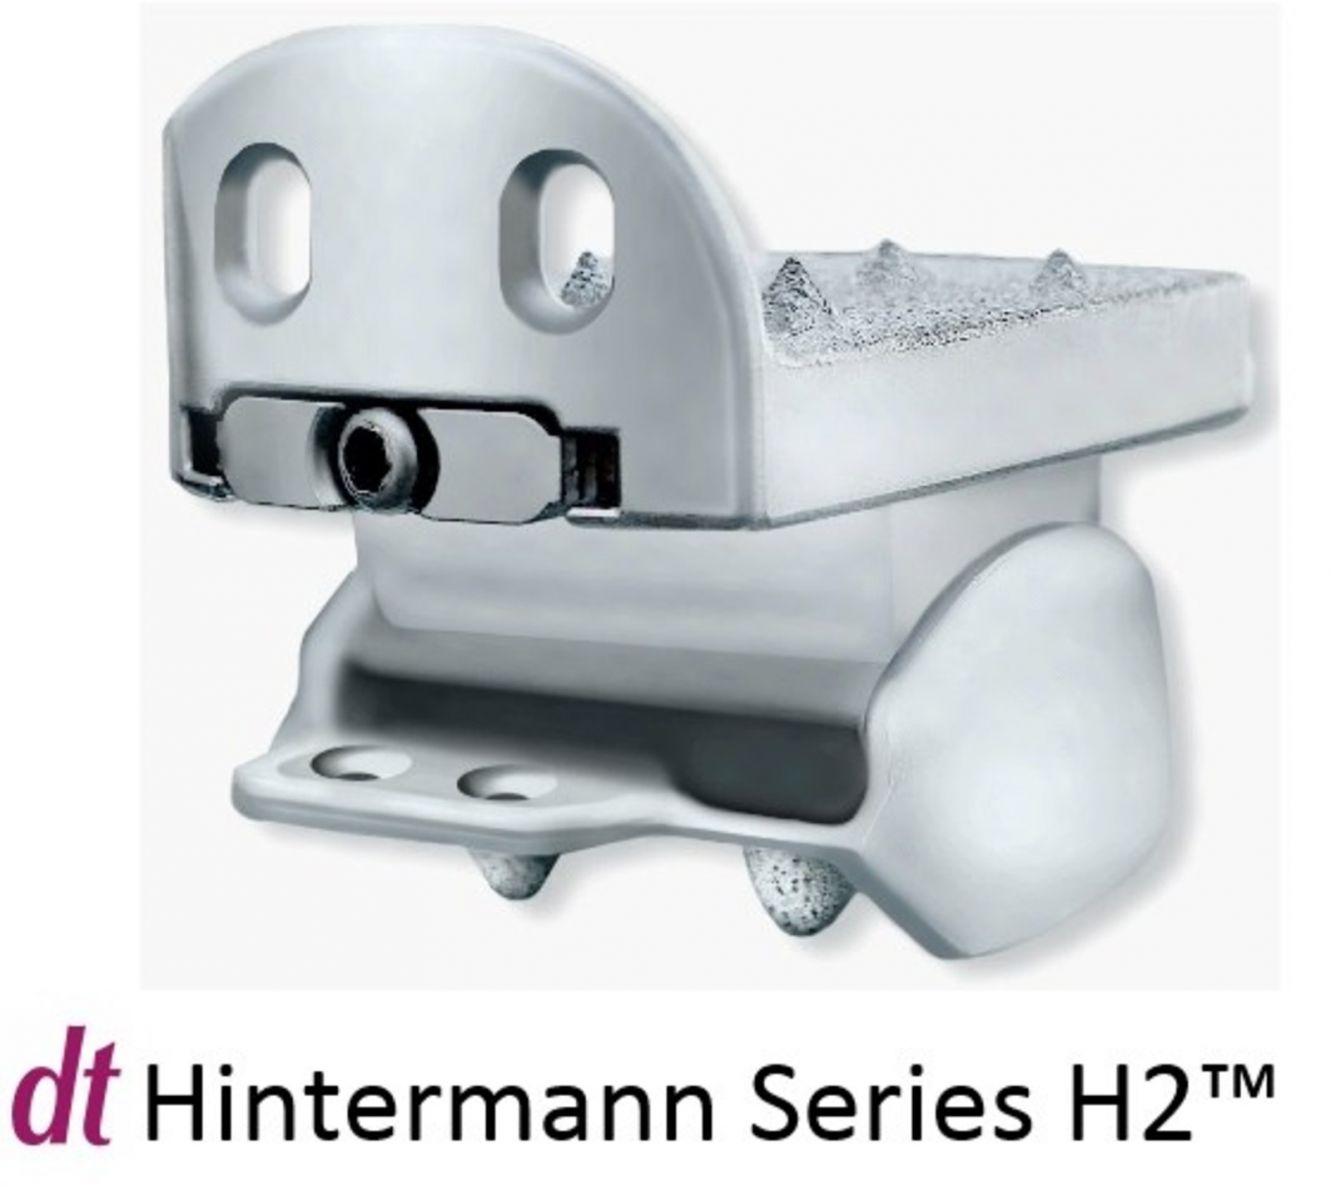 DT MedTech Hintermann Ankle